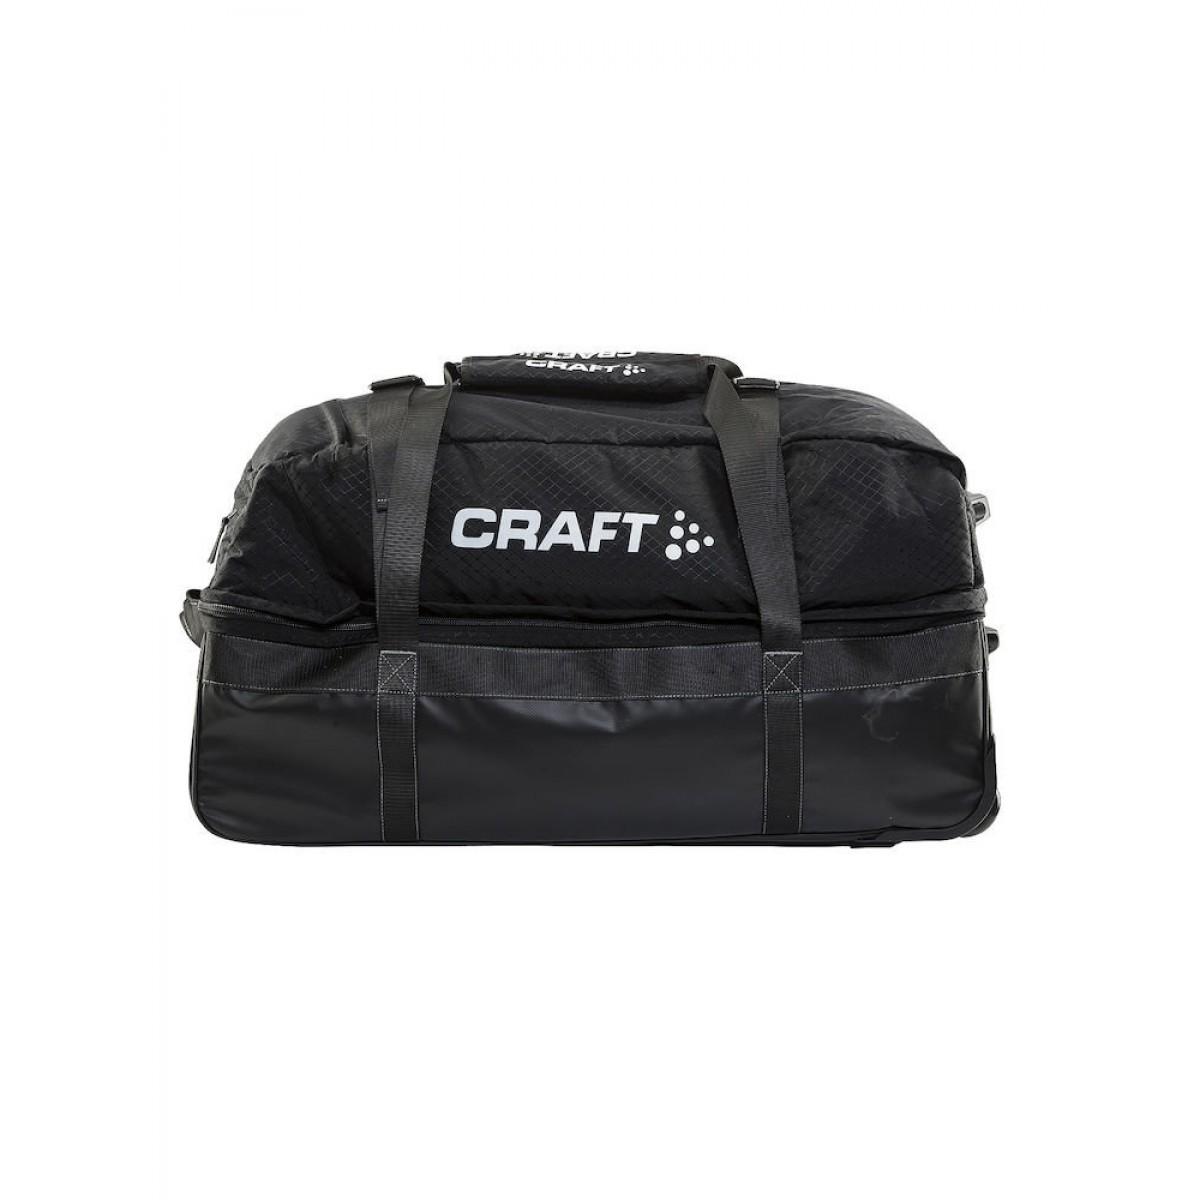 Craft Roll Bag-31